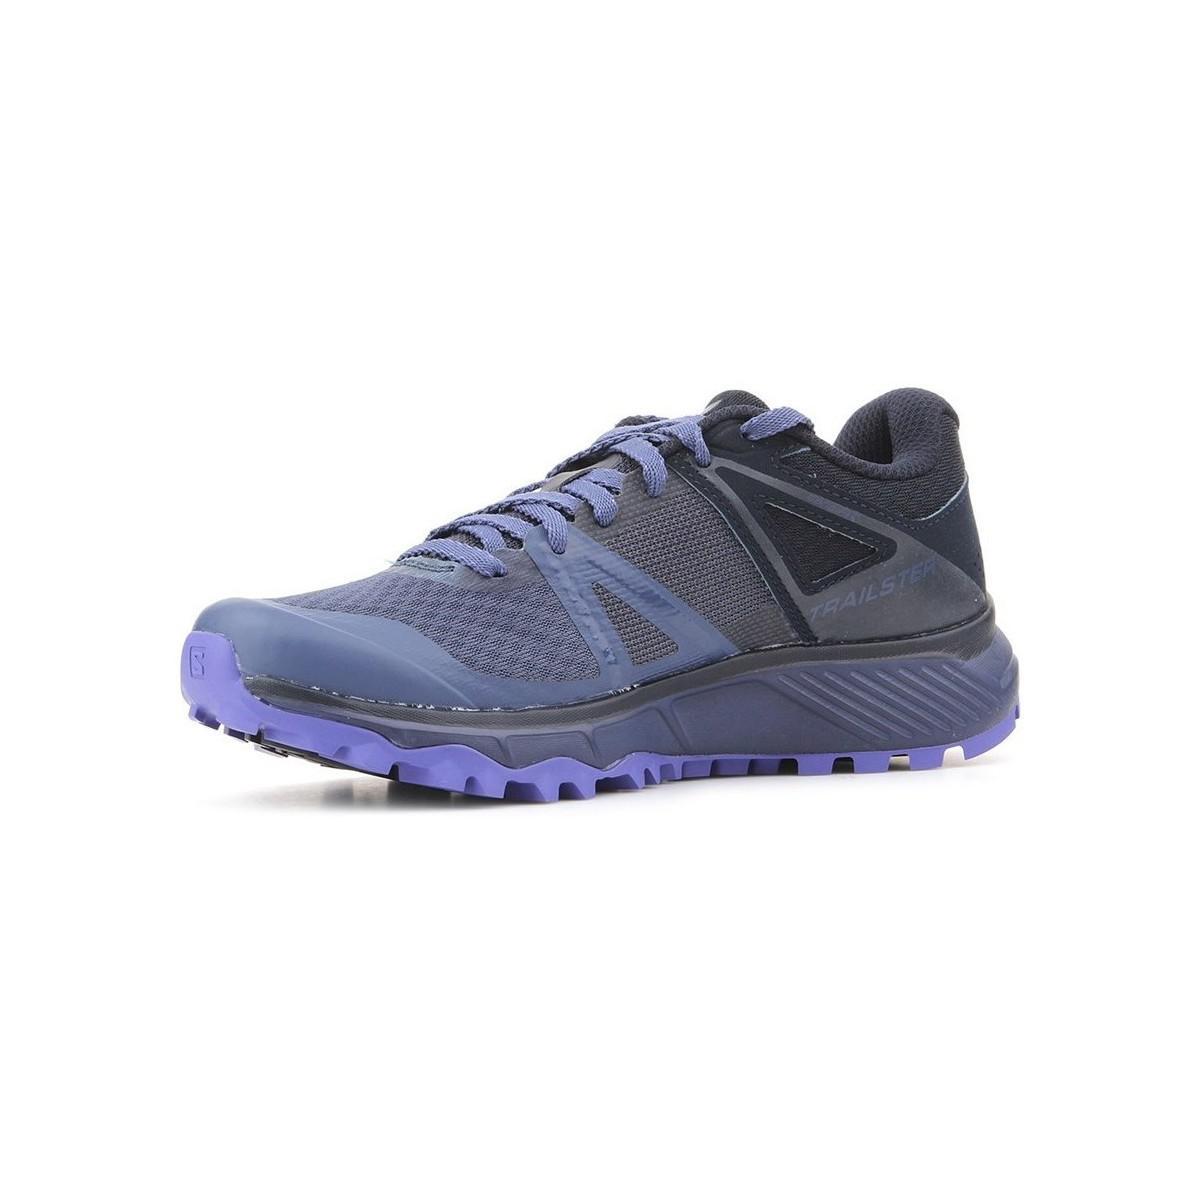 a0adbdec853c Yves Salomon Trailster W Women s Shoes (trainers) In Grey in Gray - Lyst